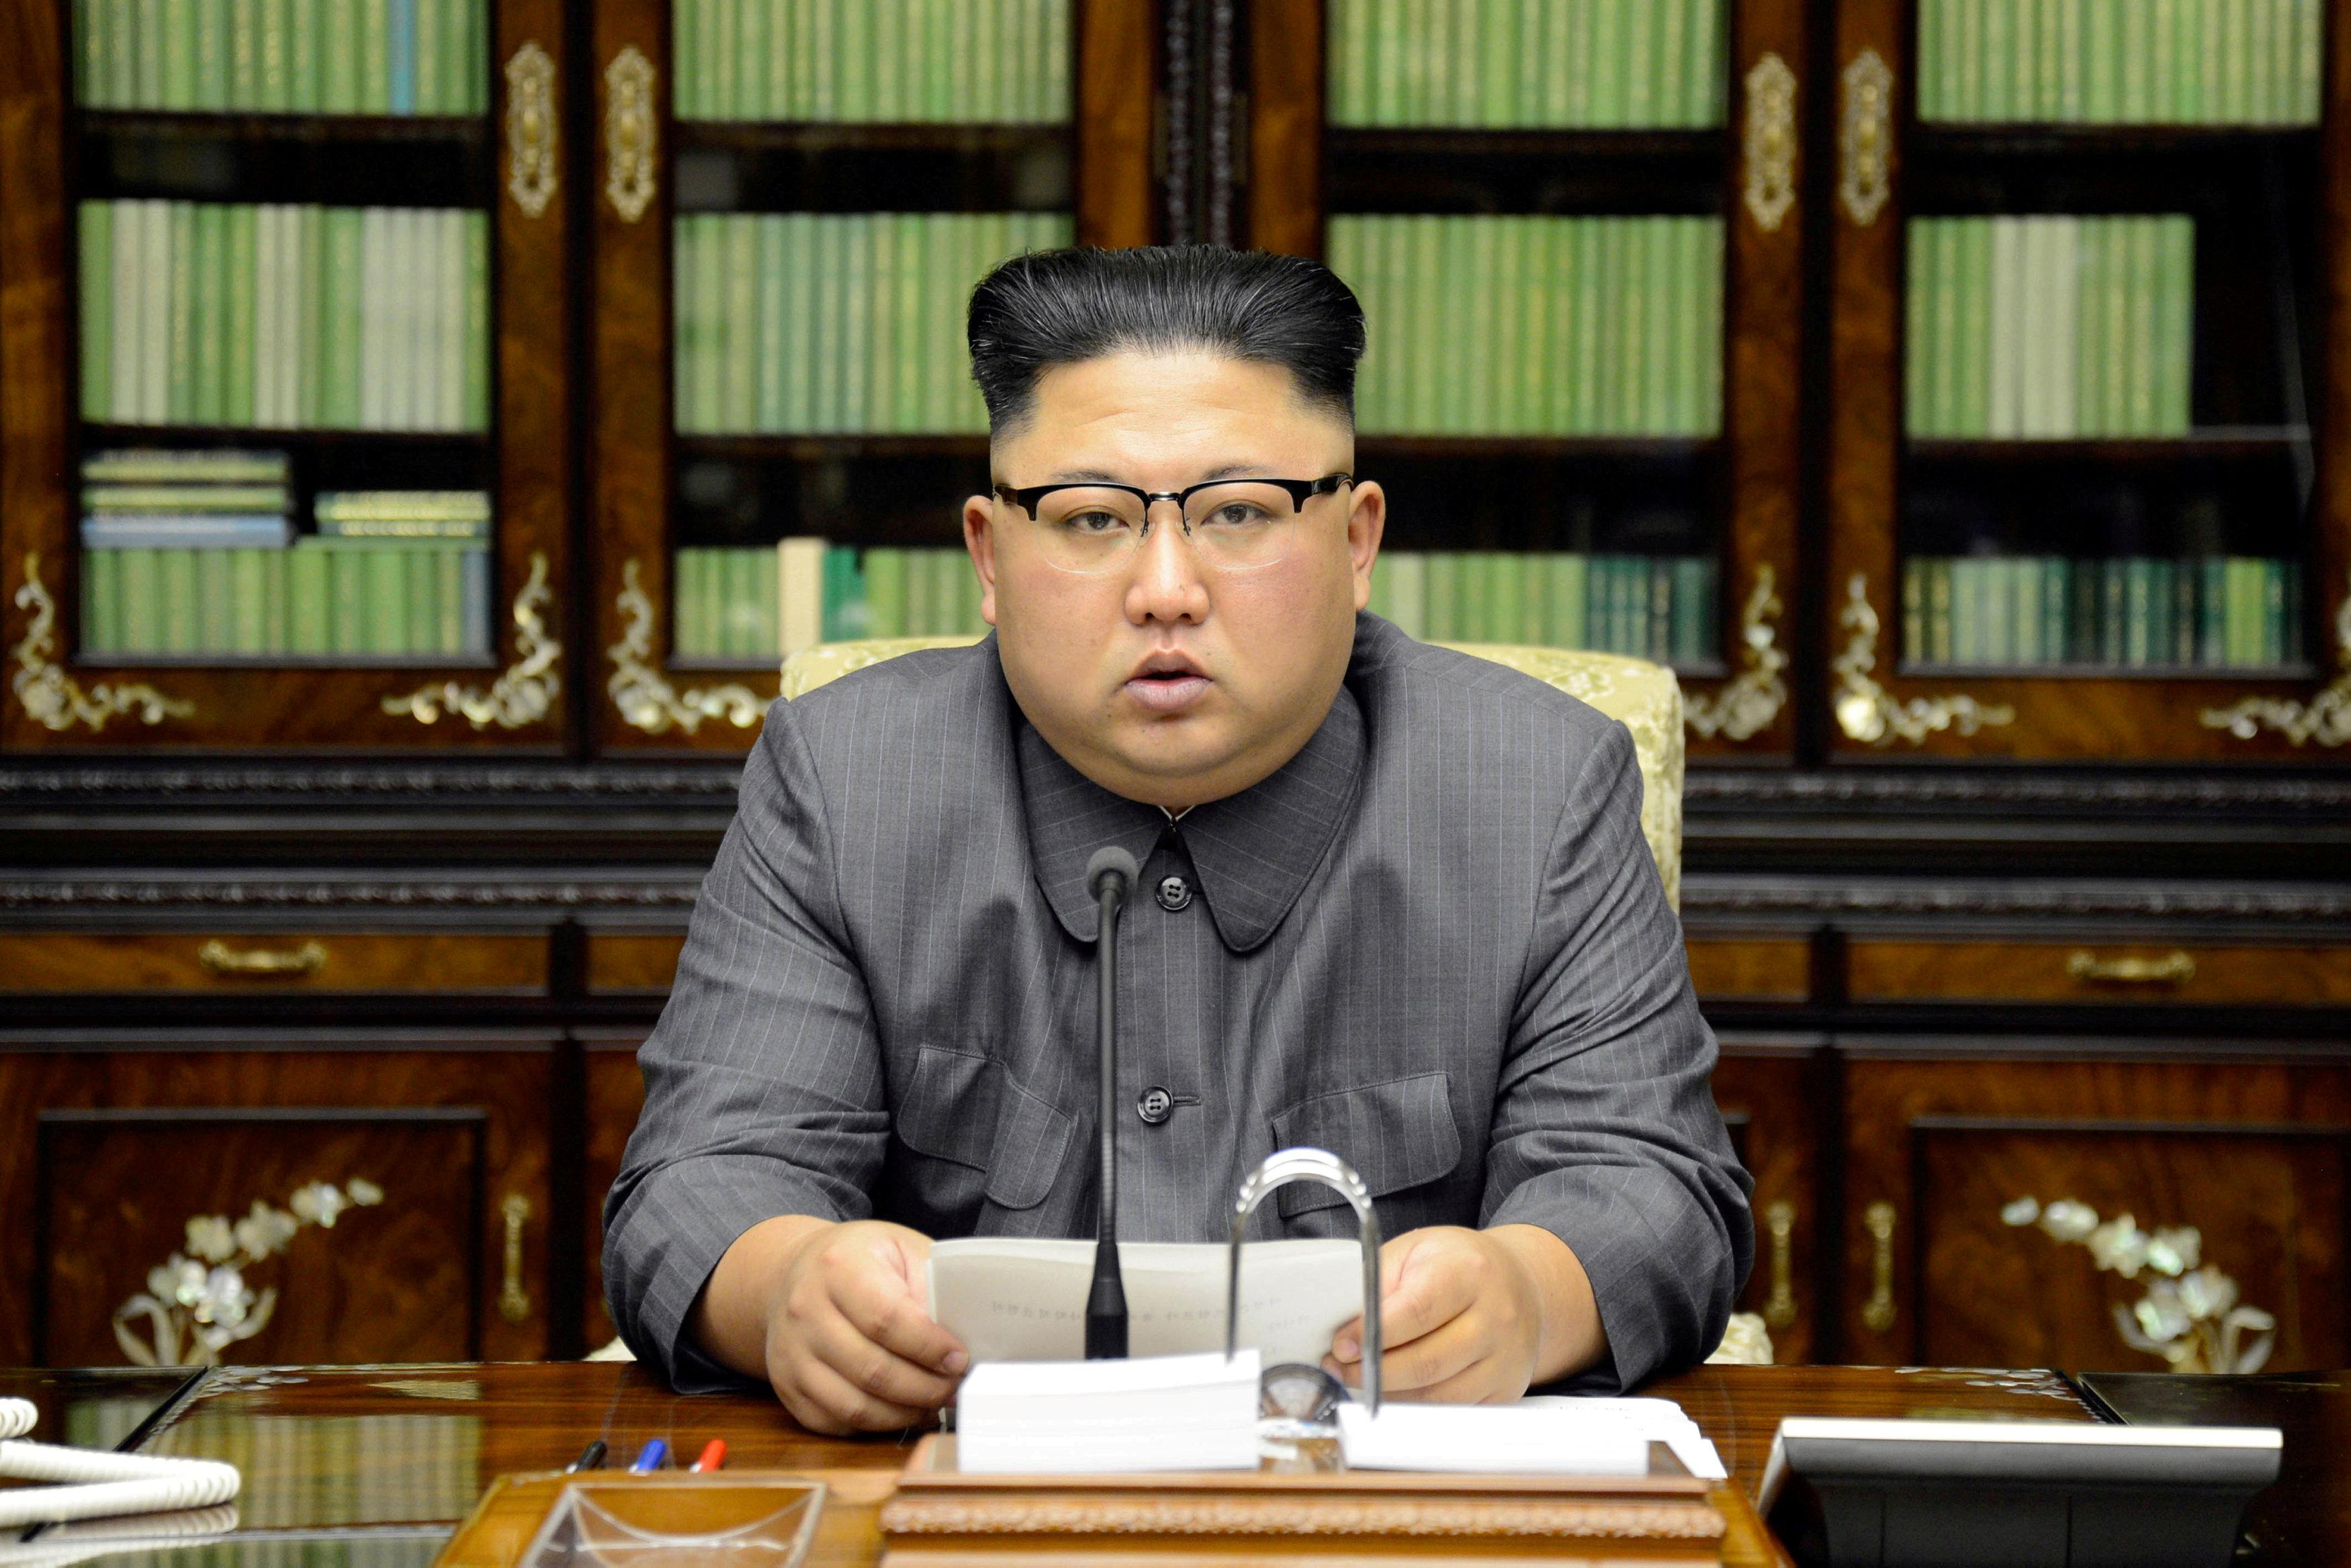 FILE PHOTO: North Korea's leader Kim Jong Un makes a statement regarding U.S. President Donald Trump's speech at the U.N. general assembly, in this undated photo released by North Korea's Korean Central News Agency (KCNA) in Pyongyang September 22, 2017. KCNA via REUTERS/File Photo